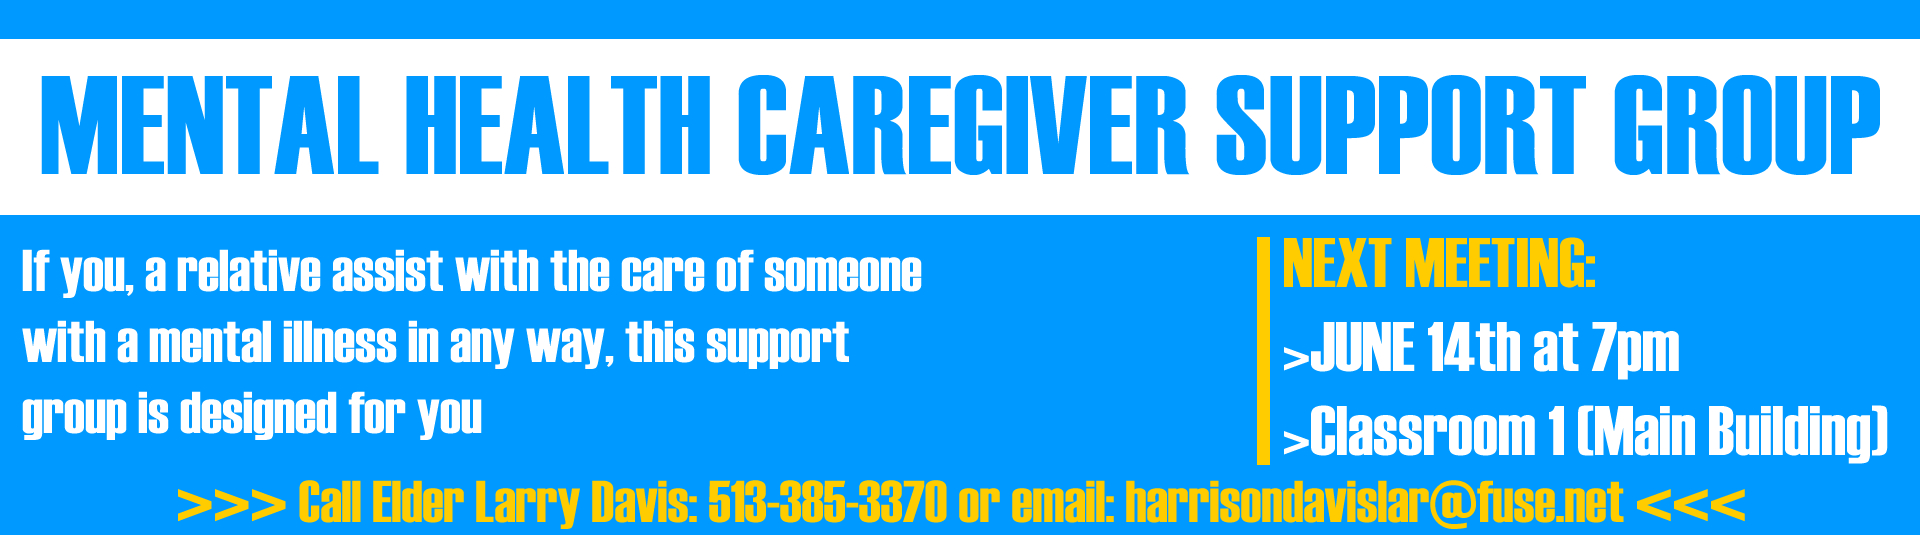 Mental Health Caregiver